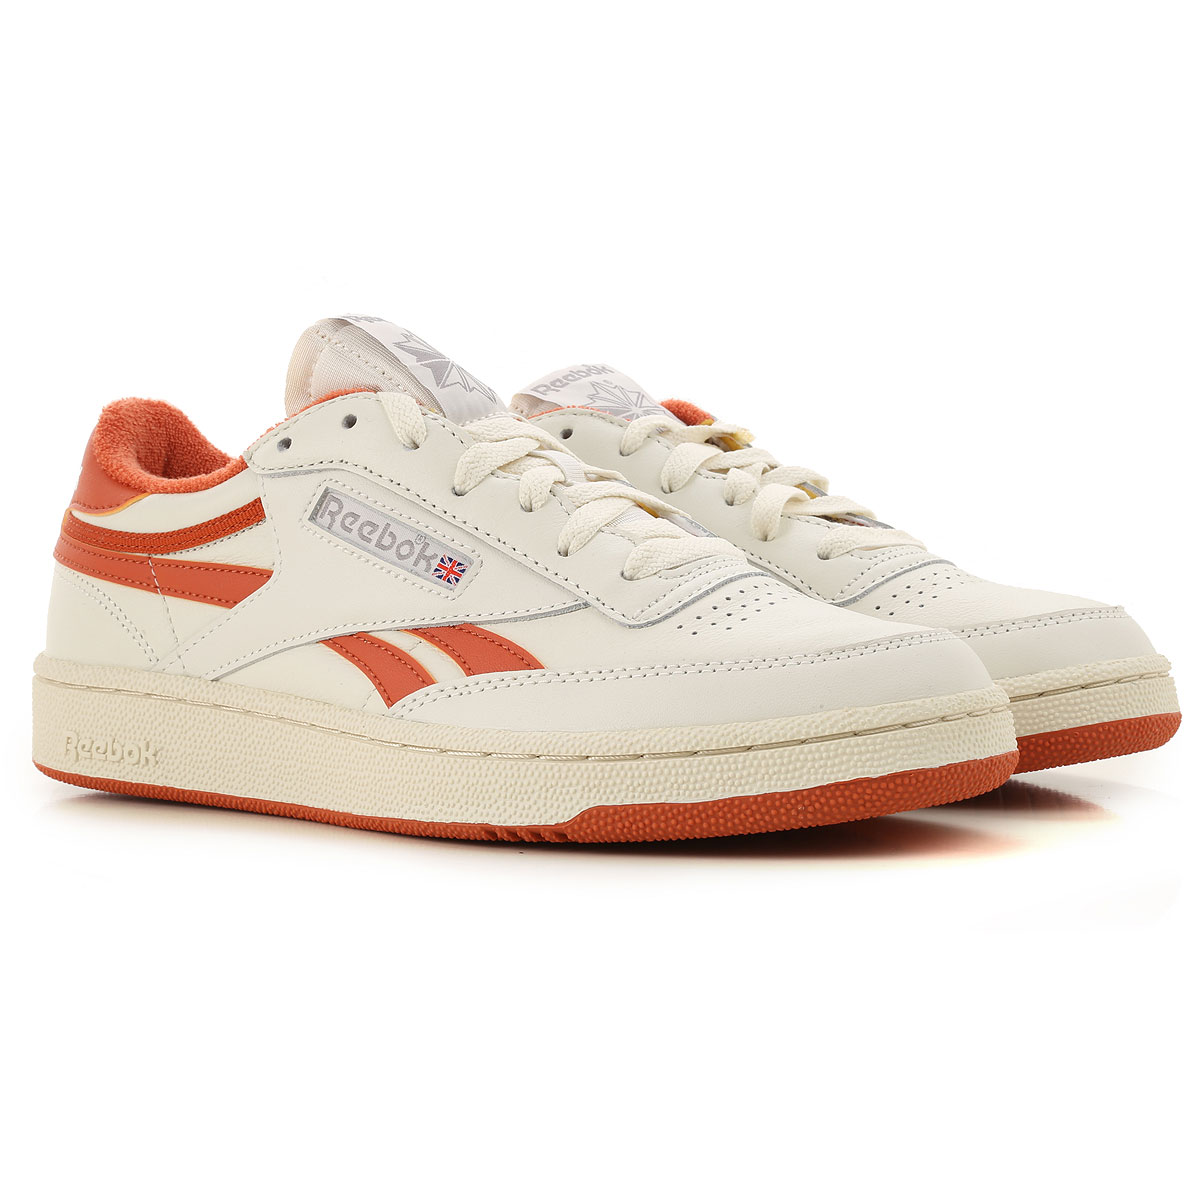 Reebok Sneakers for Men On Sale, Cream White, Fabric, 2019, 9